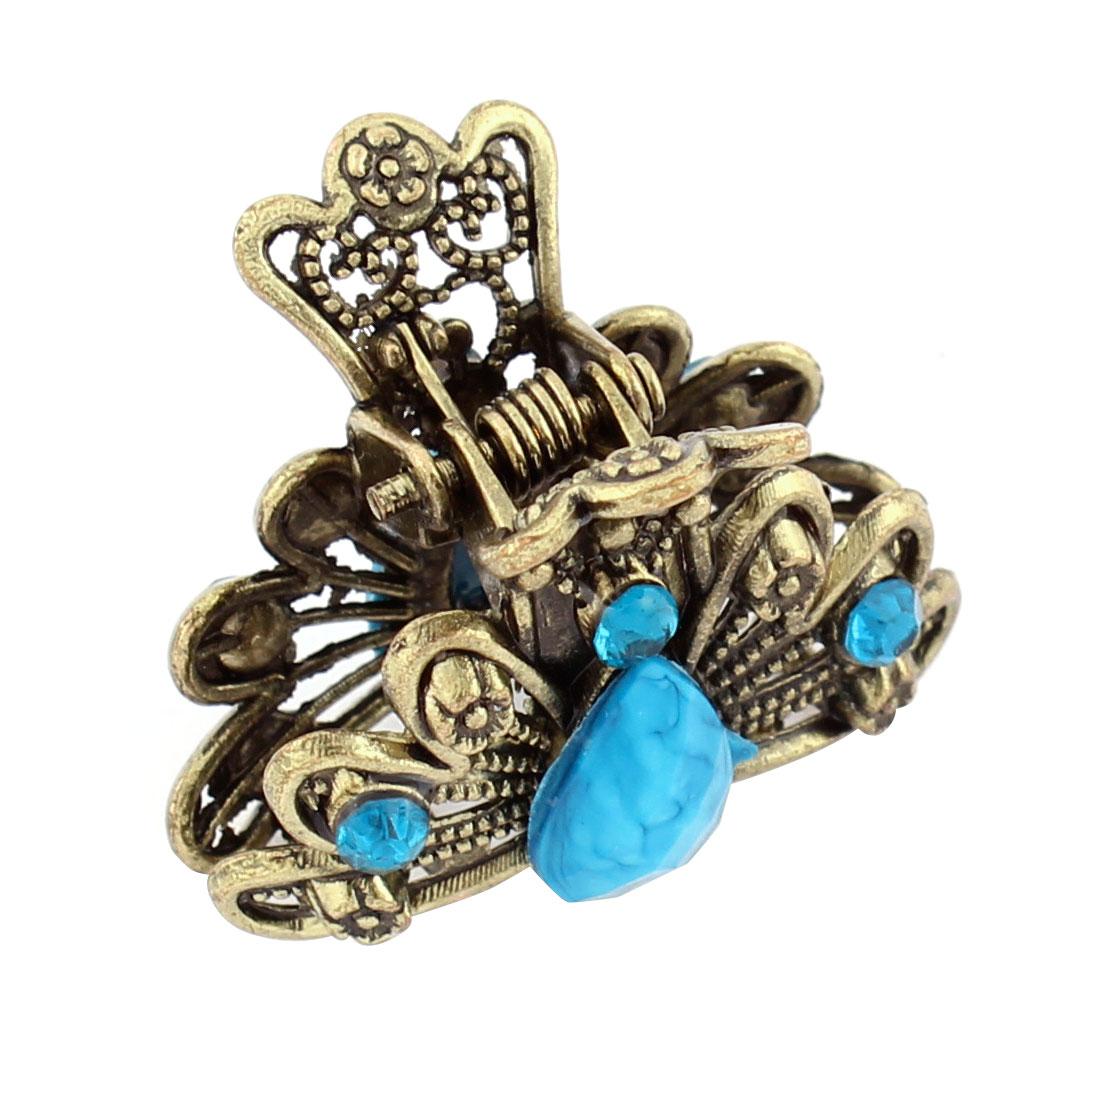 Metal Rhinestone Decor Lady Hair Claw Hairpin Clip Barrette Blue